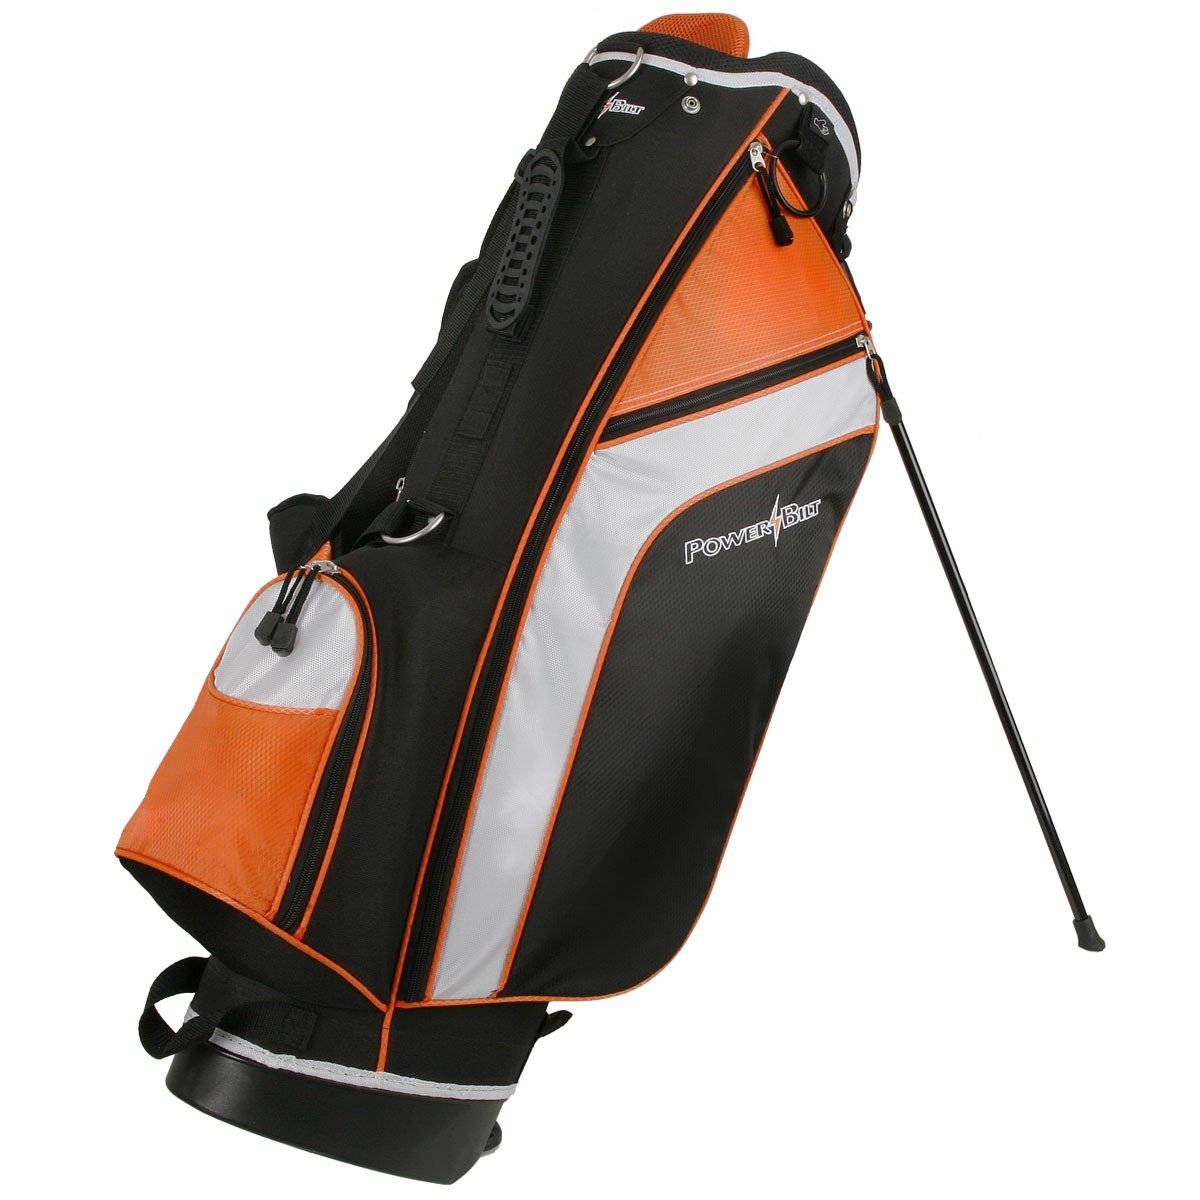 Powerbilt Santa Rosa Black/Orange Stand Golf Bag (Black/Orange)